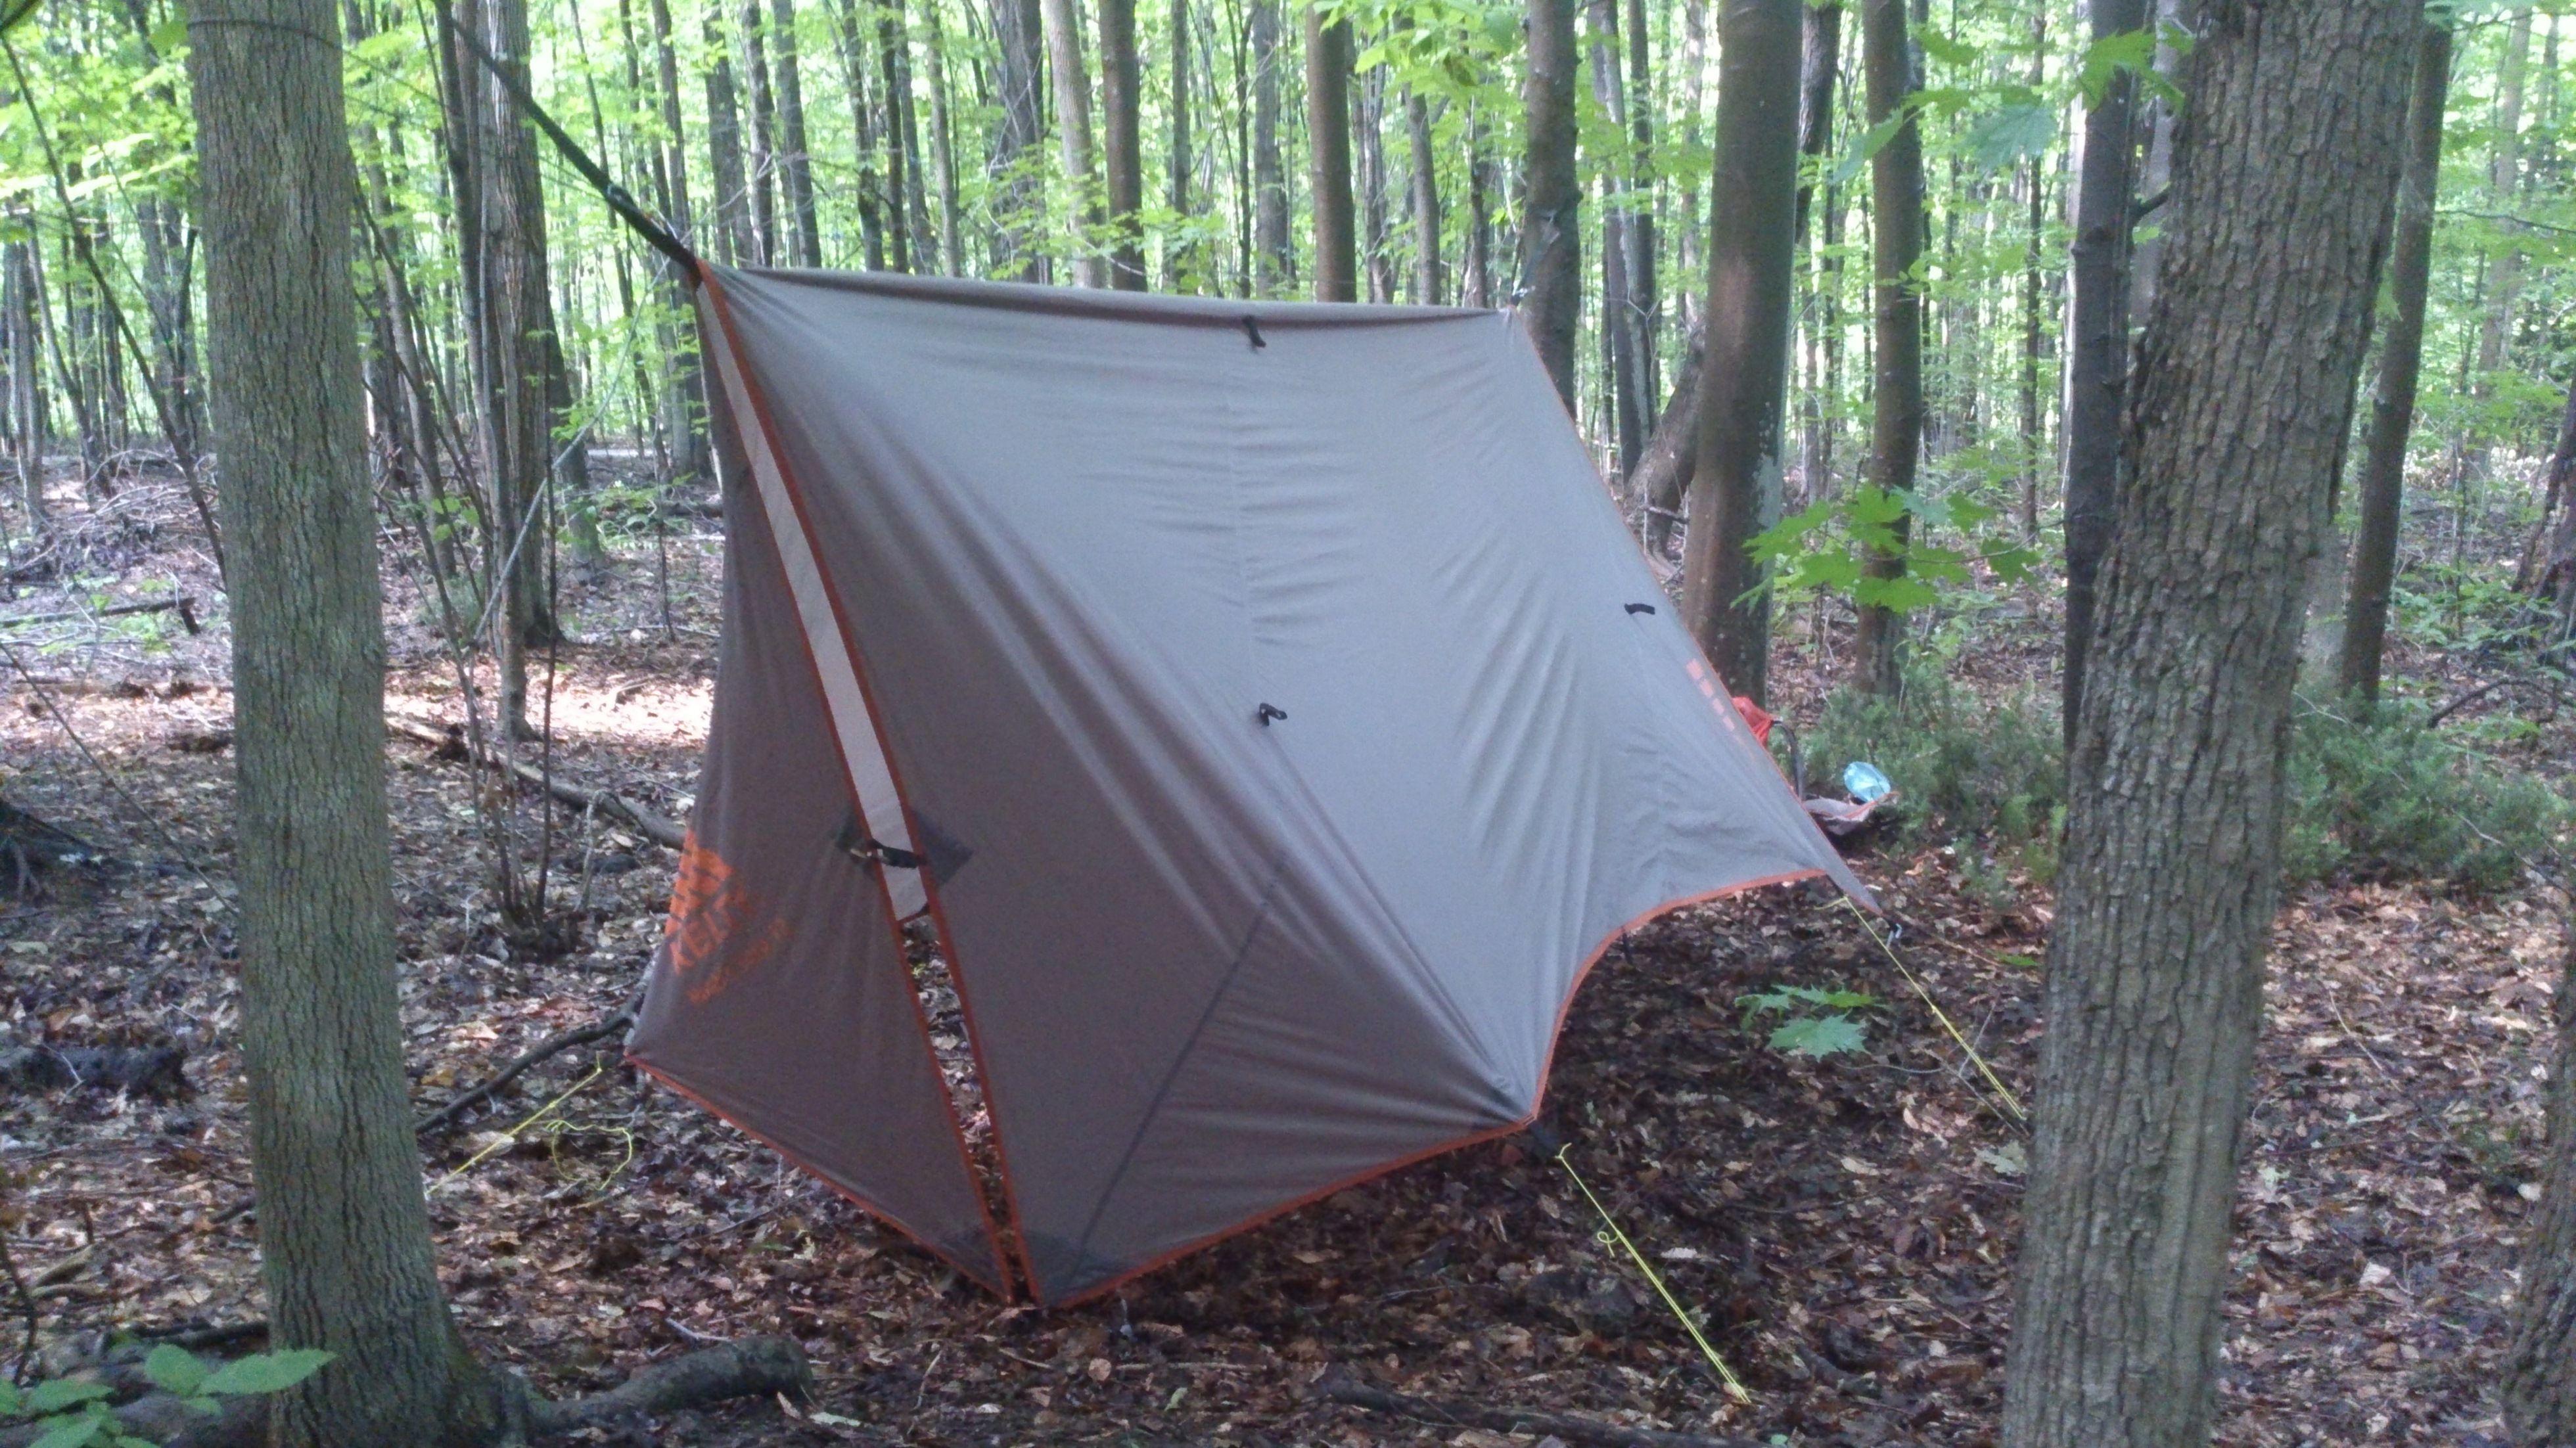 Dscoriginalg cool camping stuff pinterest